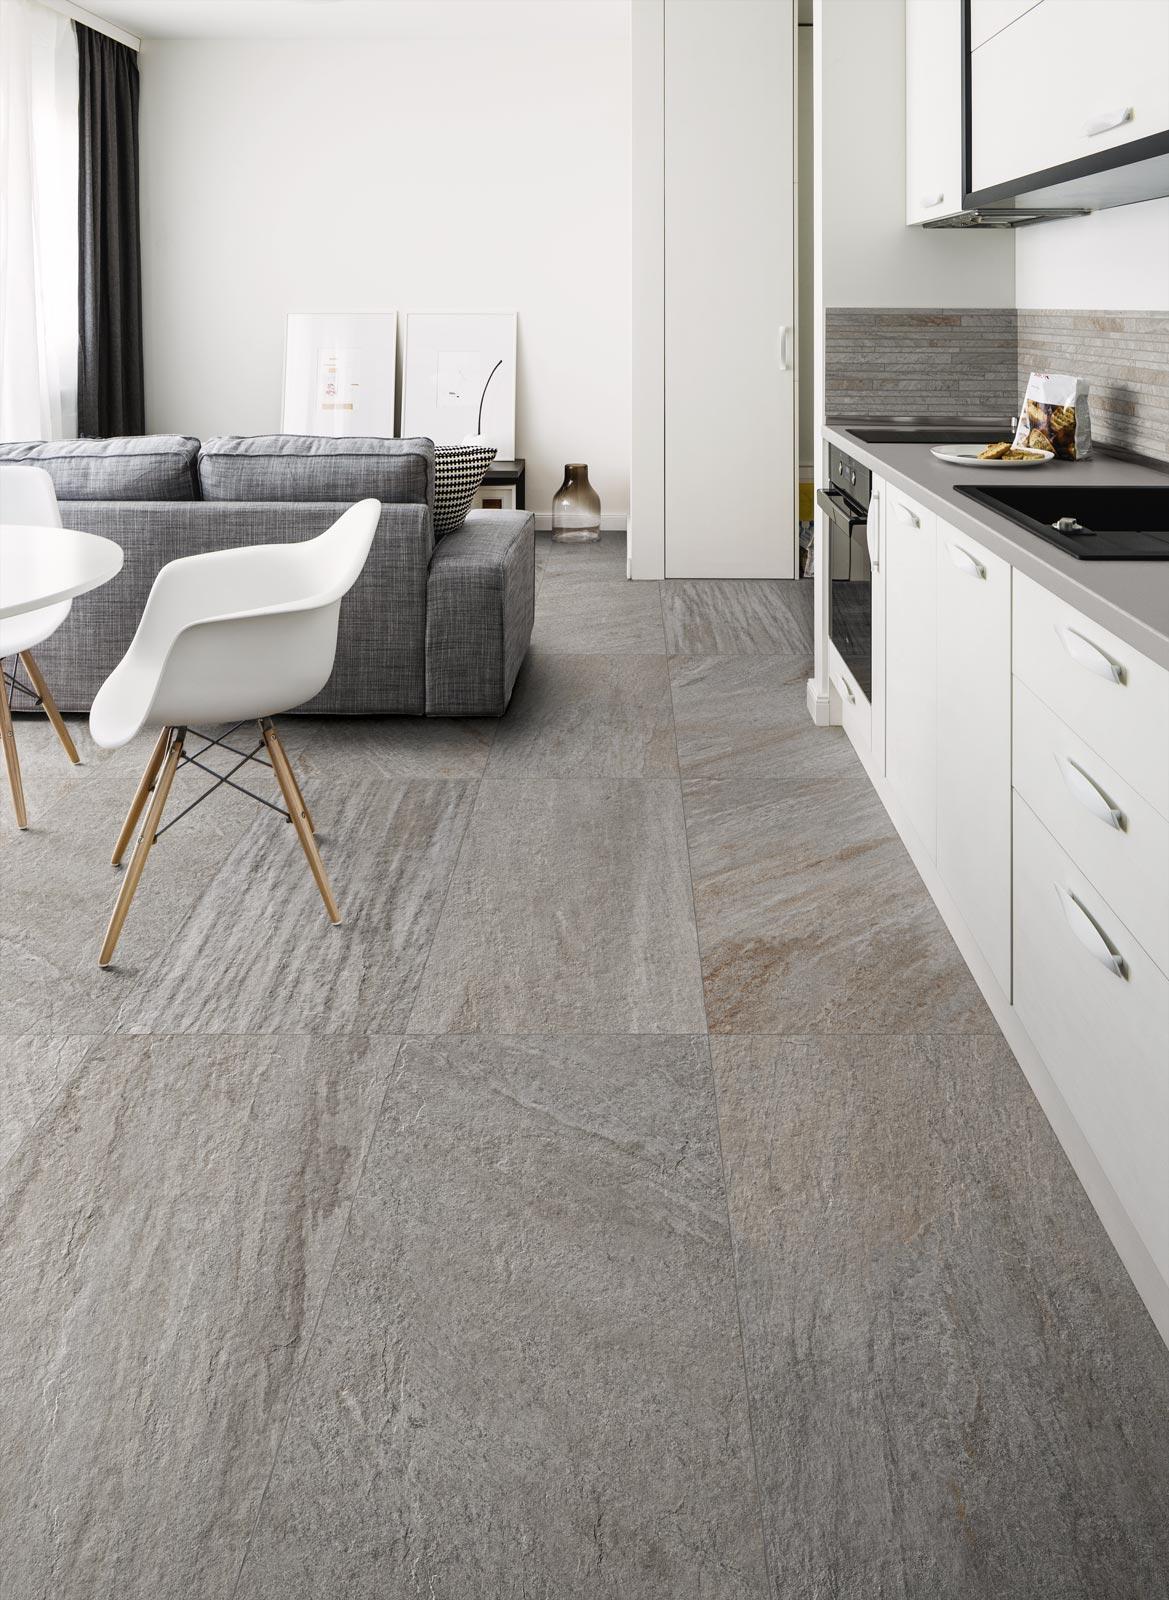 realstone quarzite collection stone effect stoneware ragno. Black Bedroom Furniture Sets. Home Design Ideas